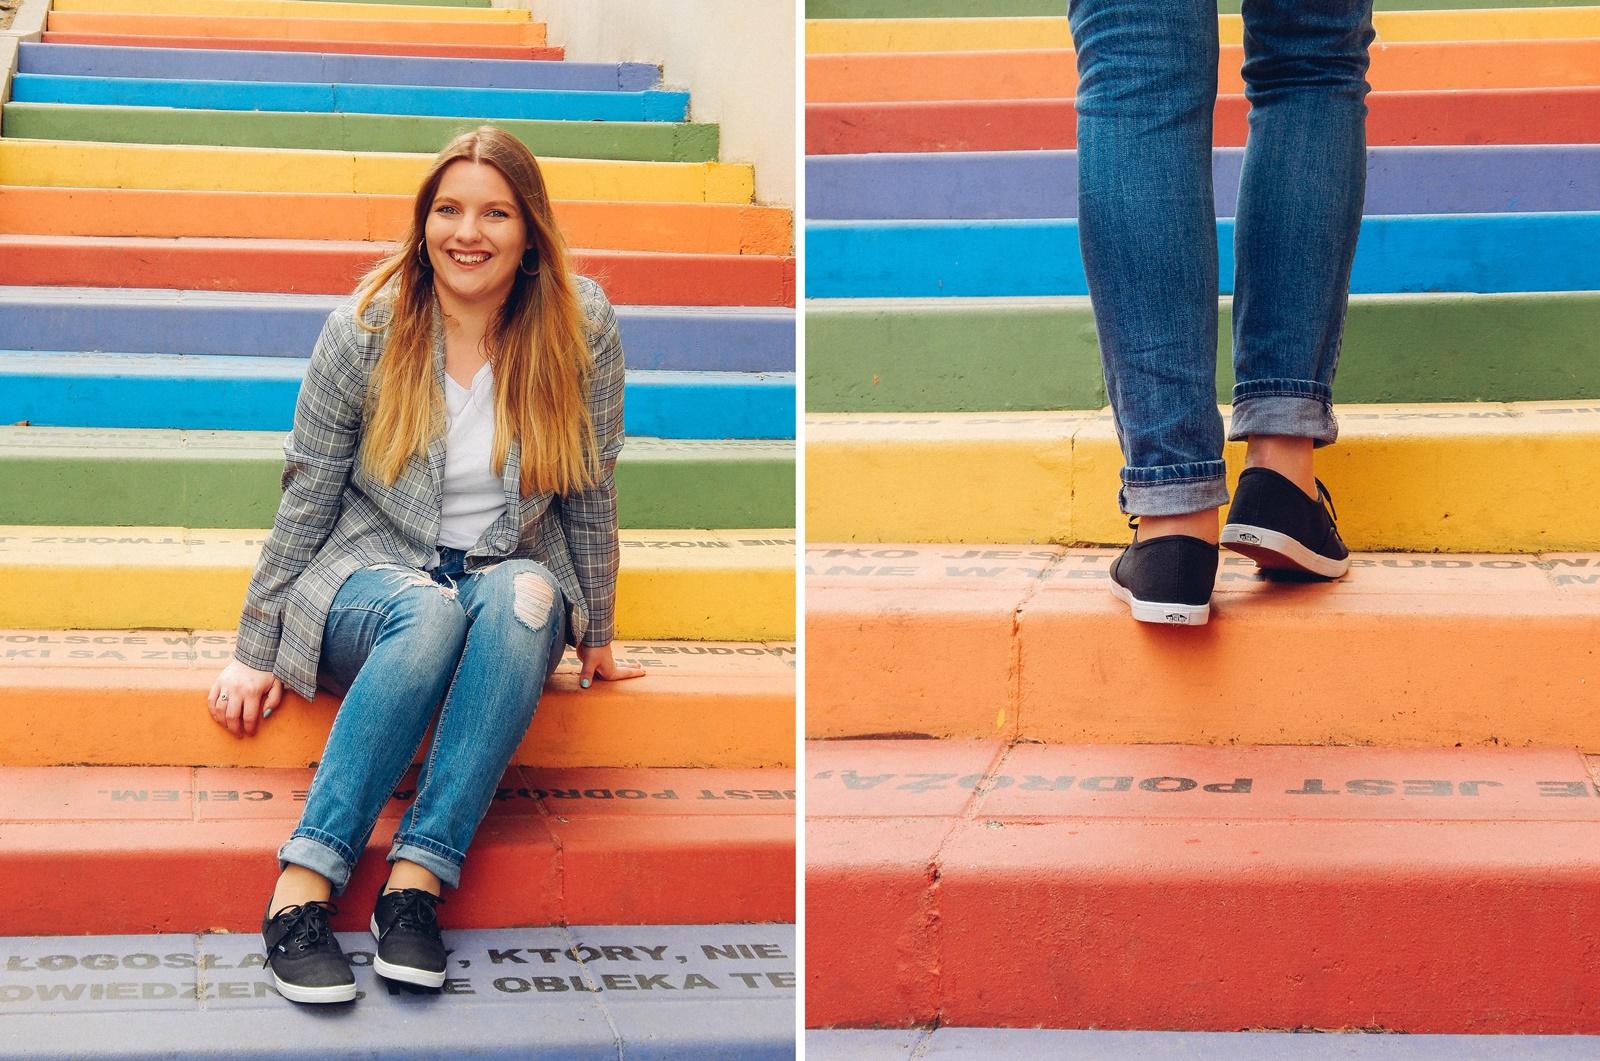 7a nakd zniżka outfit moda blog modowy jak nosić marynarkę w kratkę tshirt z kaktusem jak nosić podarte jeansy vansy moda streetwear style fashion outfit blog lifestyle łódź